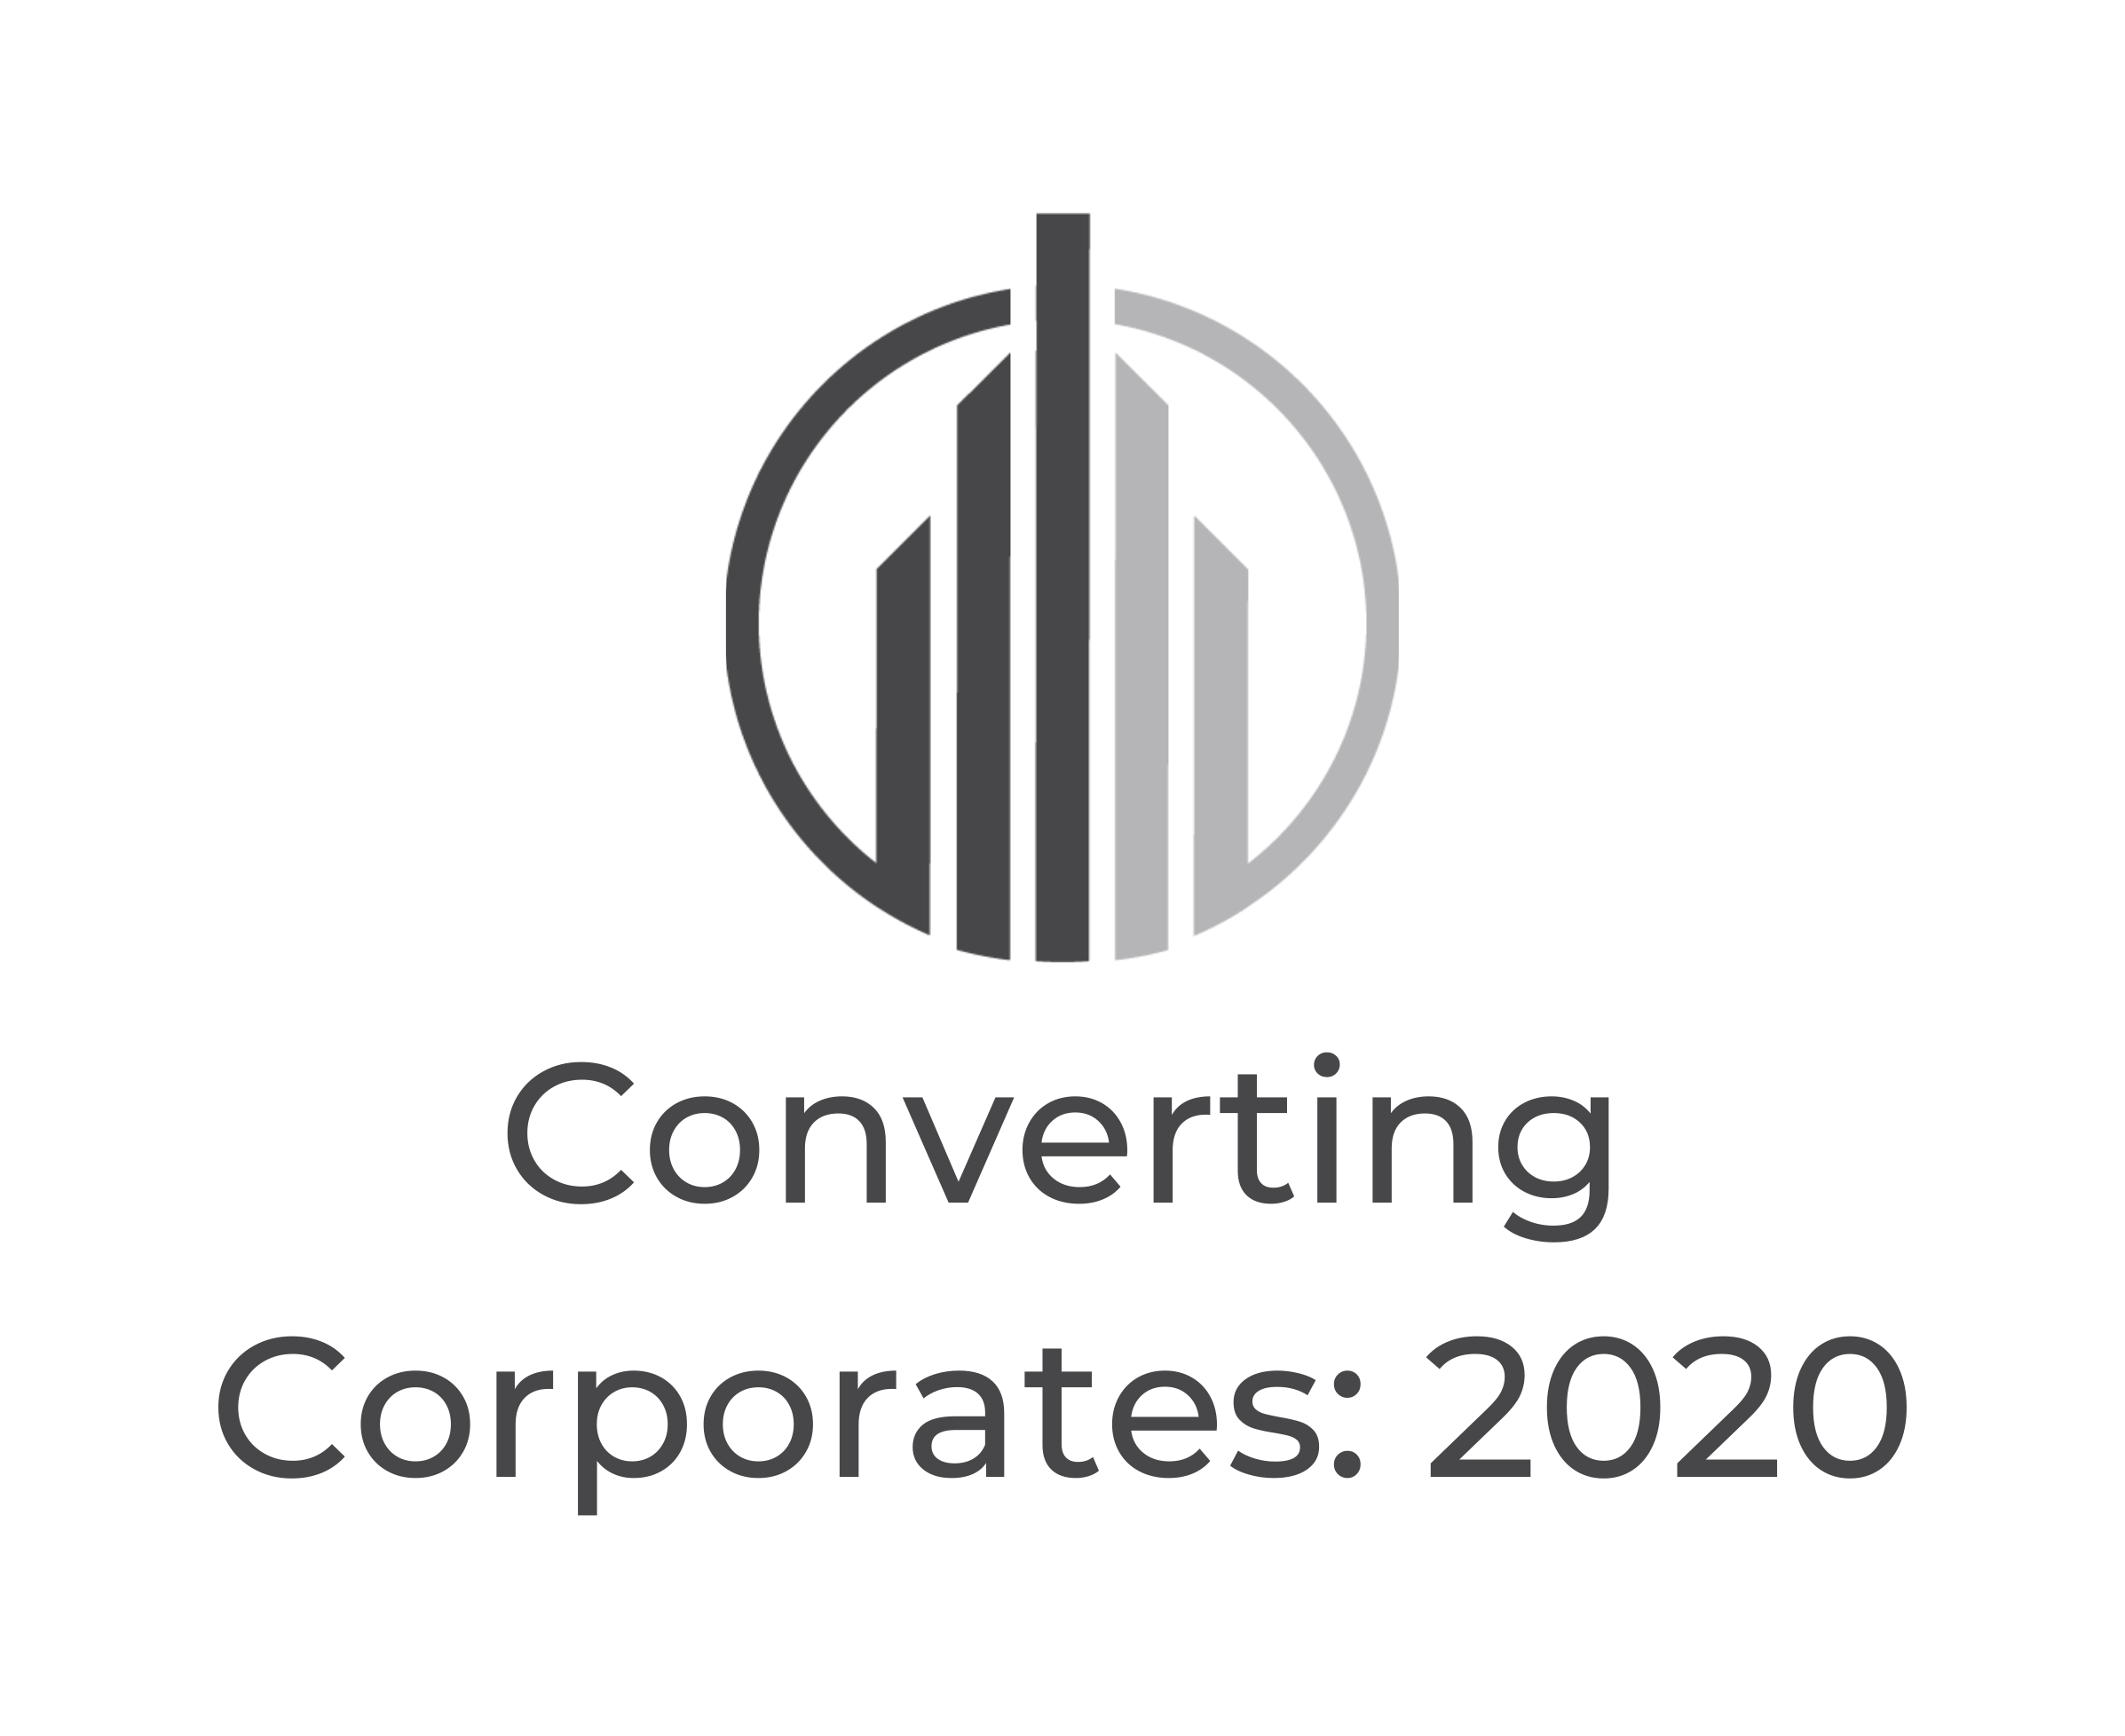 Converting Corporates 2020